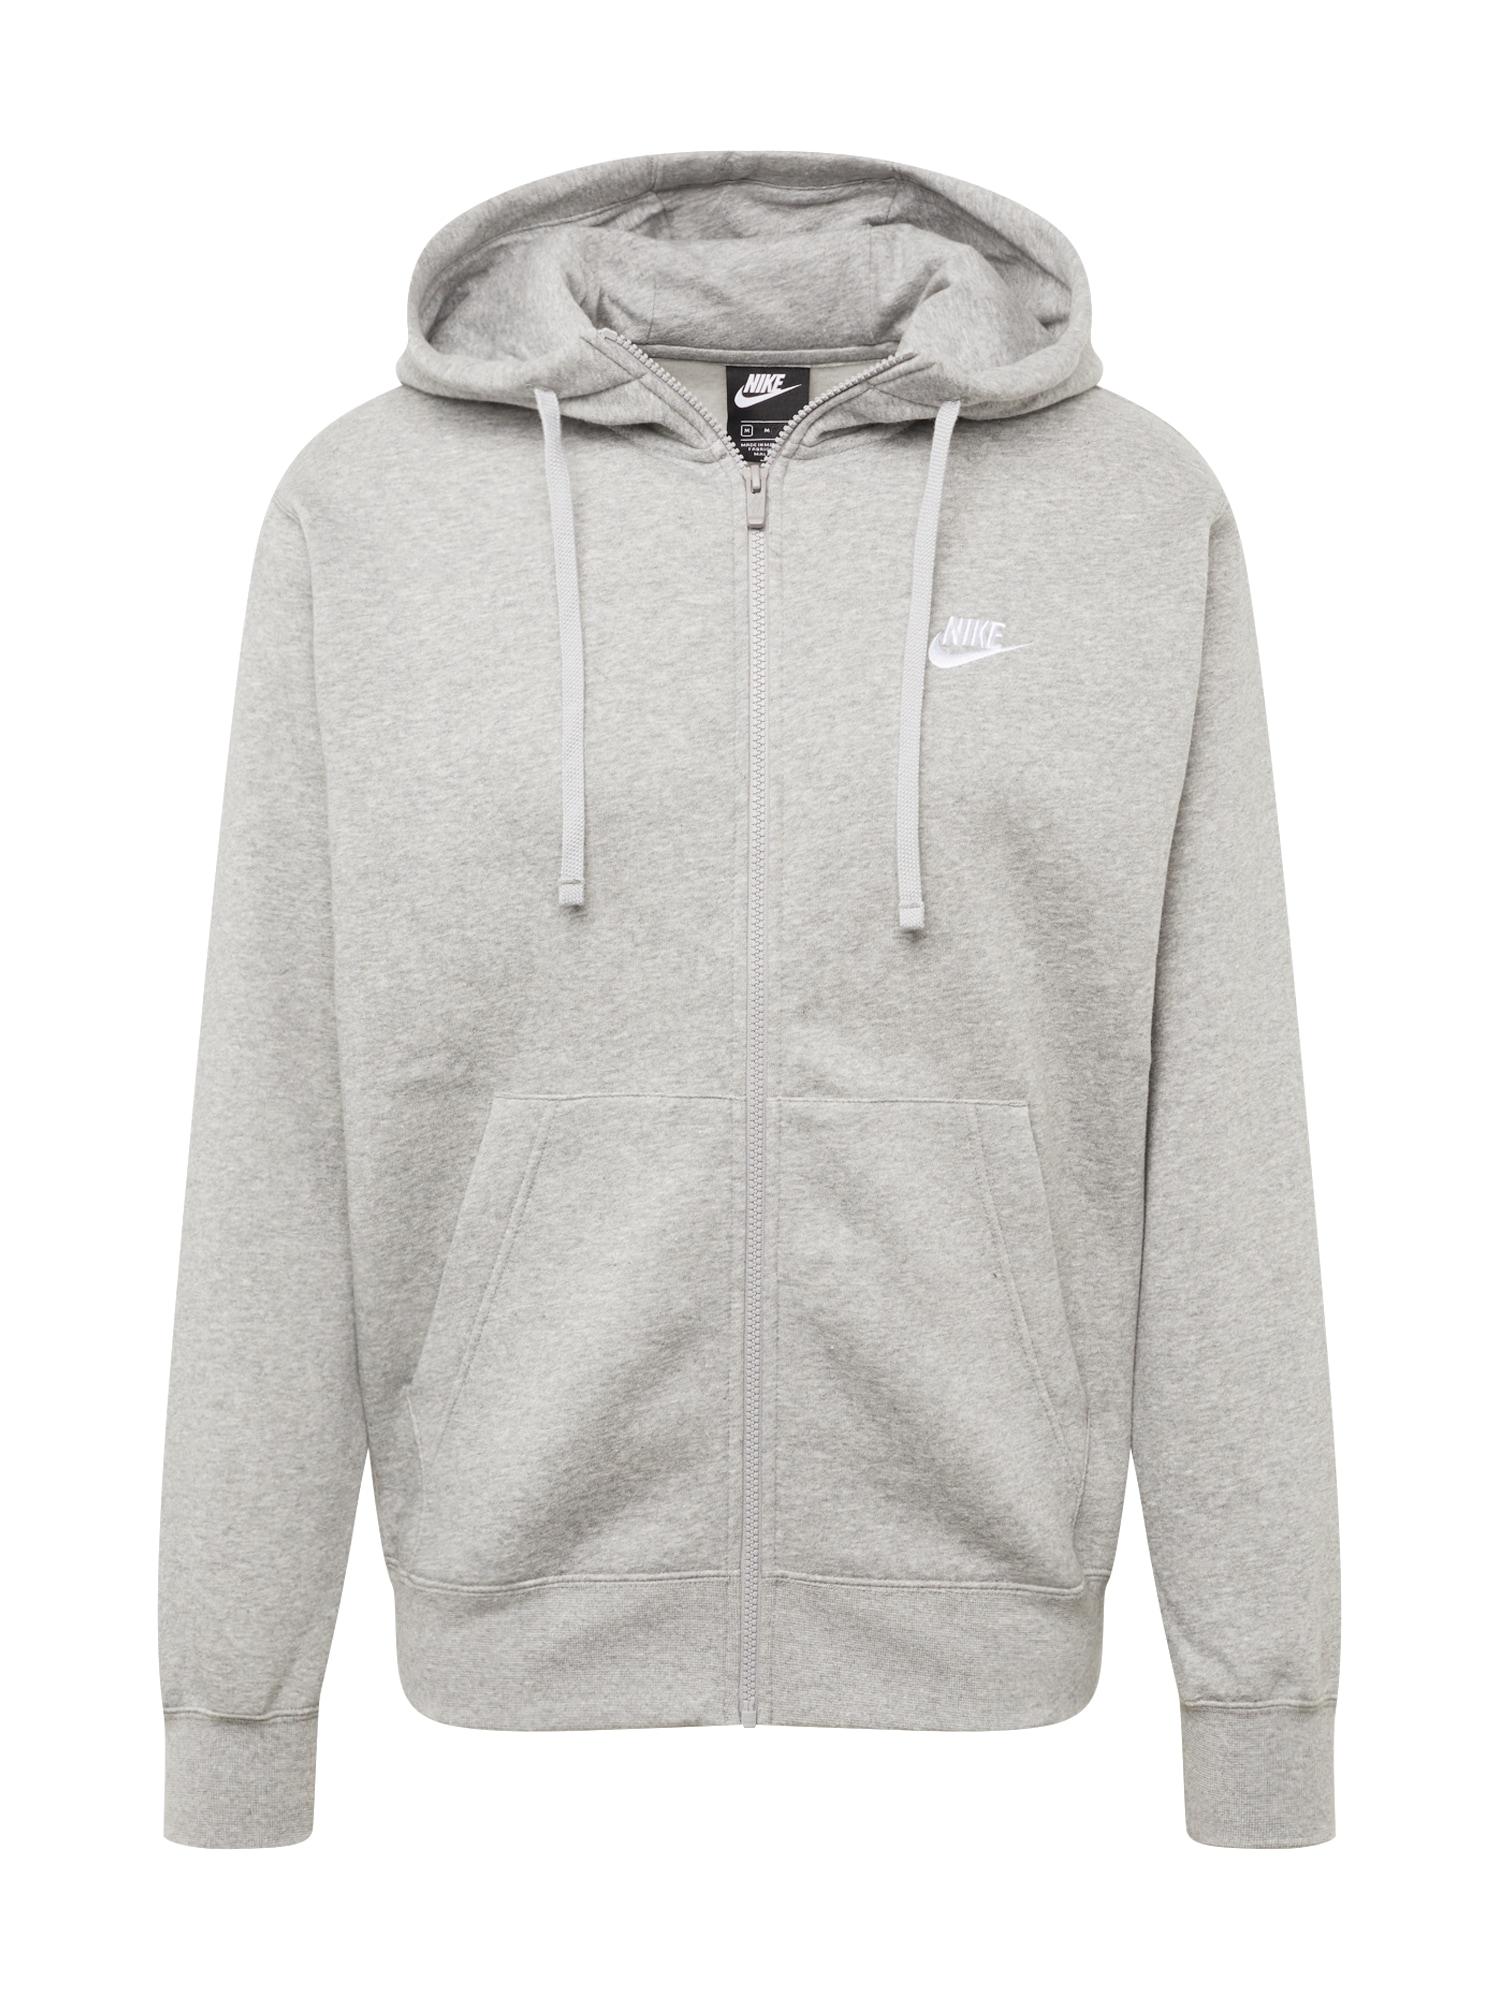 Nike Sportswear Džemperis margai pilka